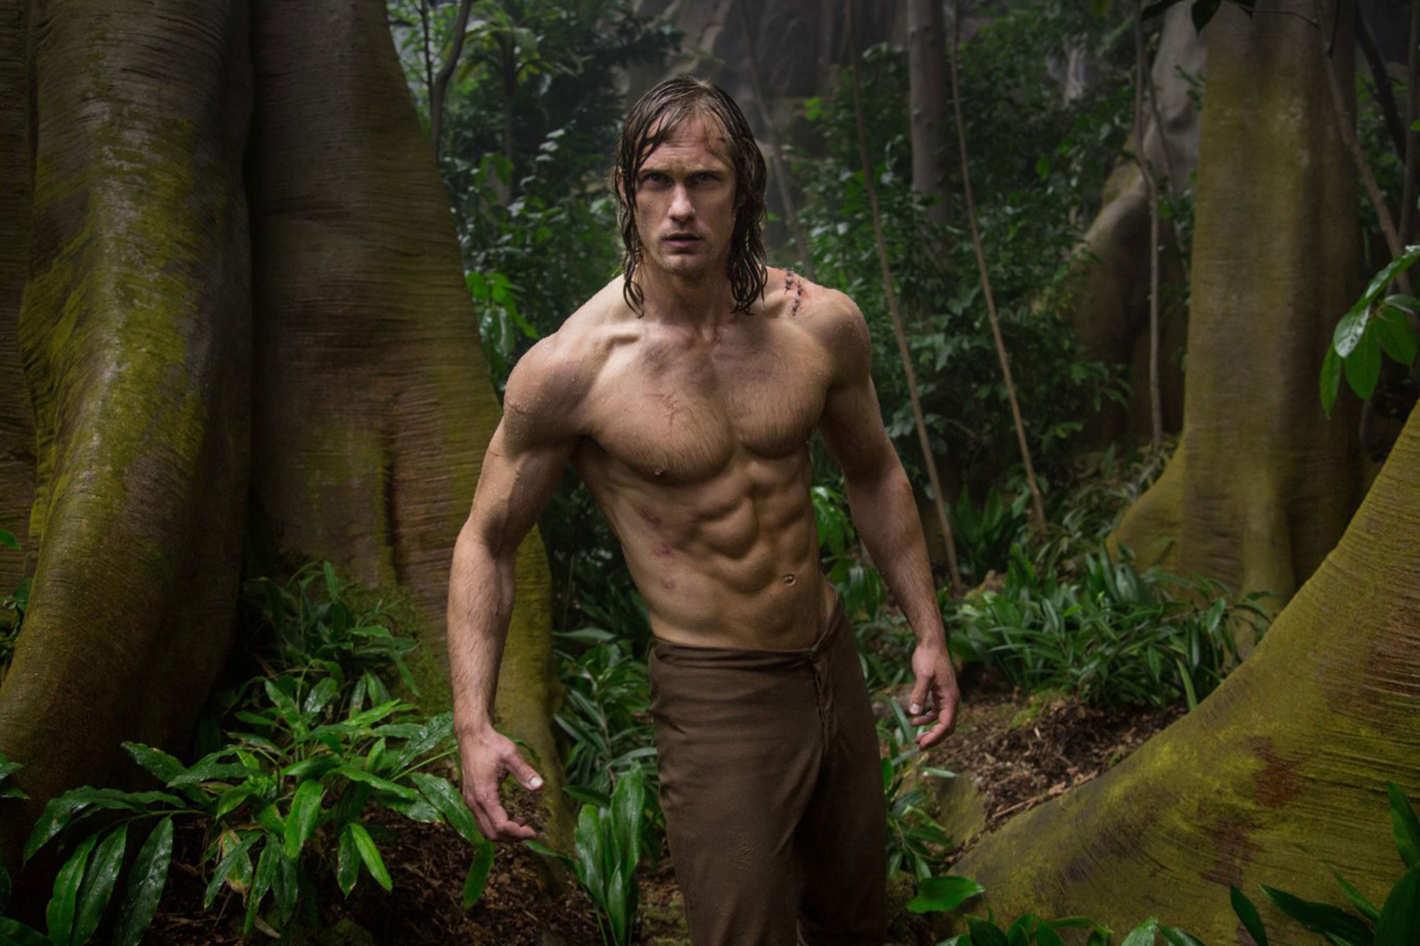 Alexander Skarsgård as Tarzan in The Legend of Tarzan (2016)